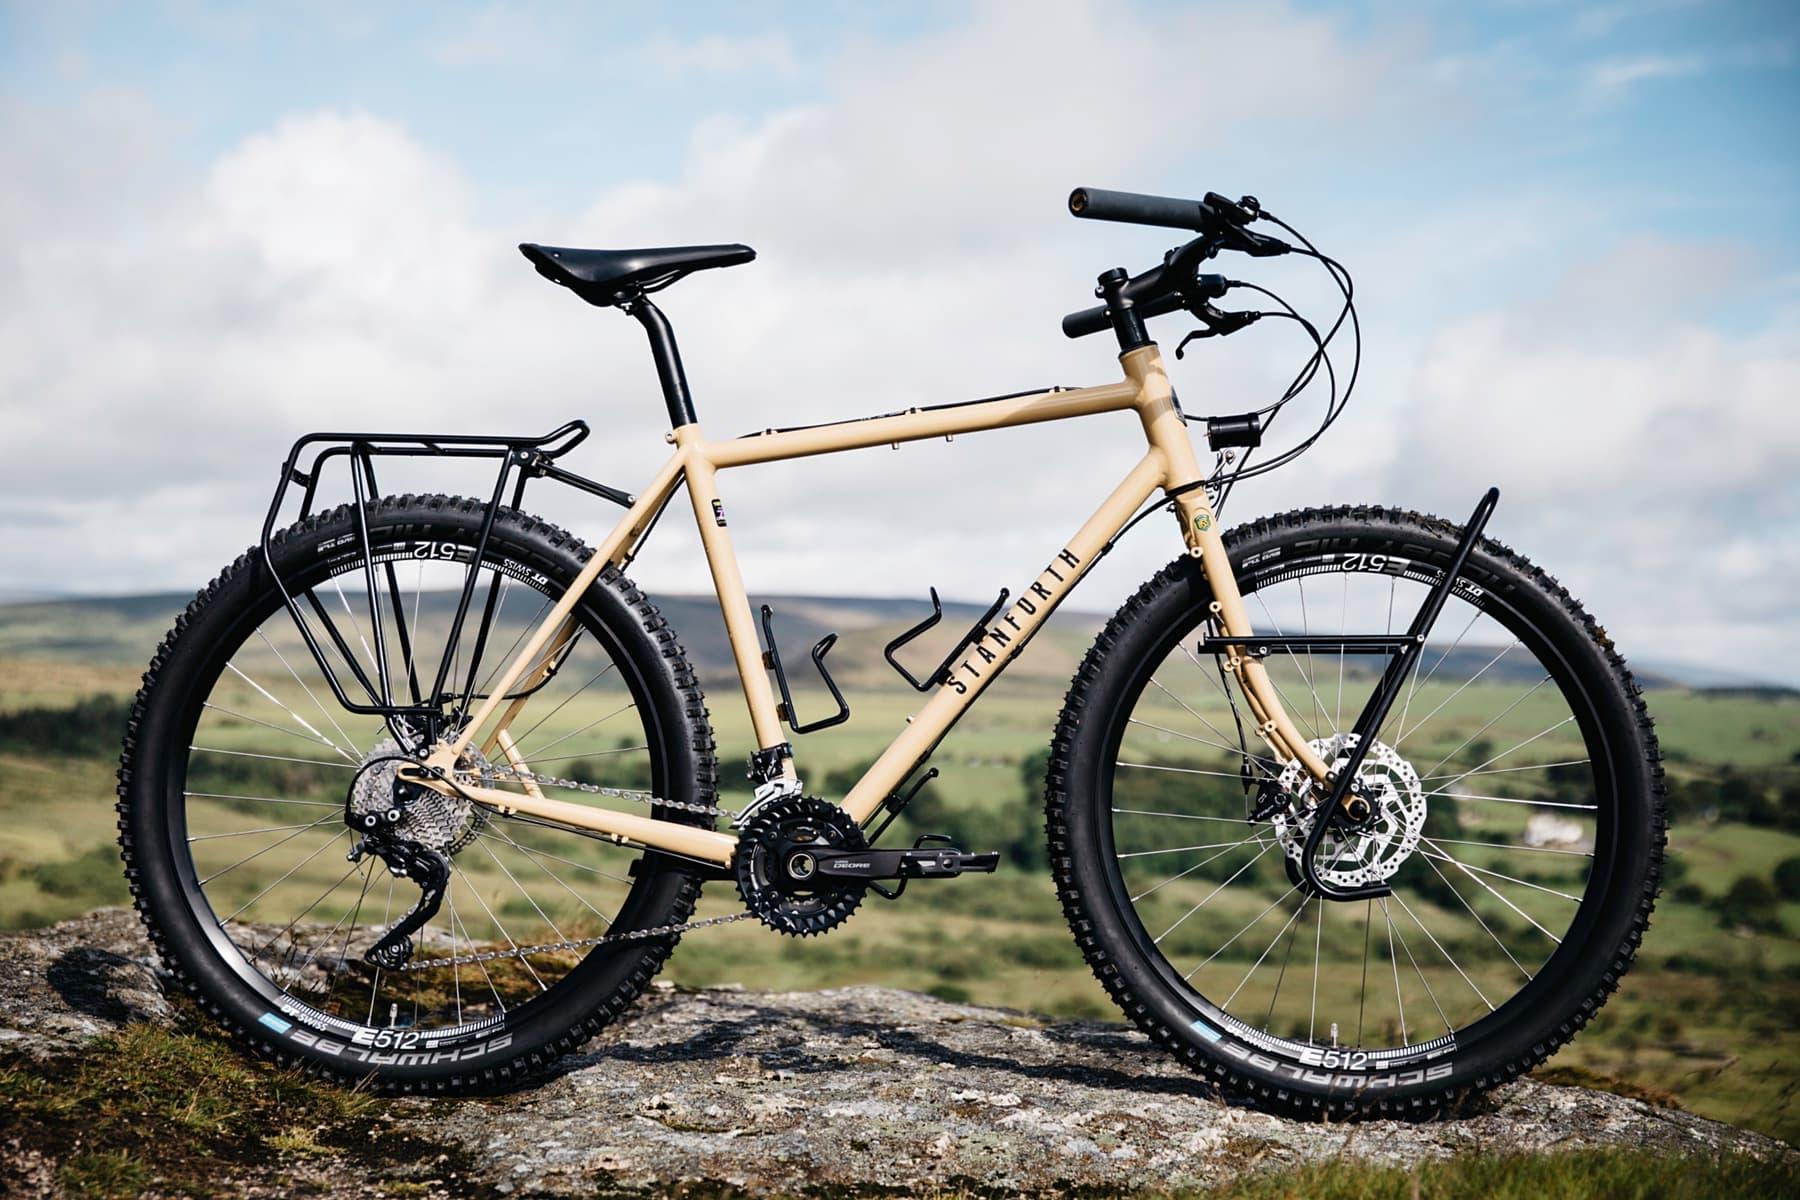 Introducing The New Stanforth Pamira – Custom Extreme Adventure Bike